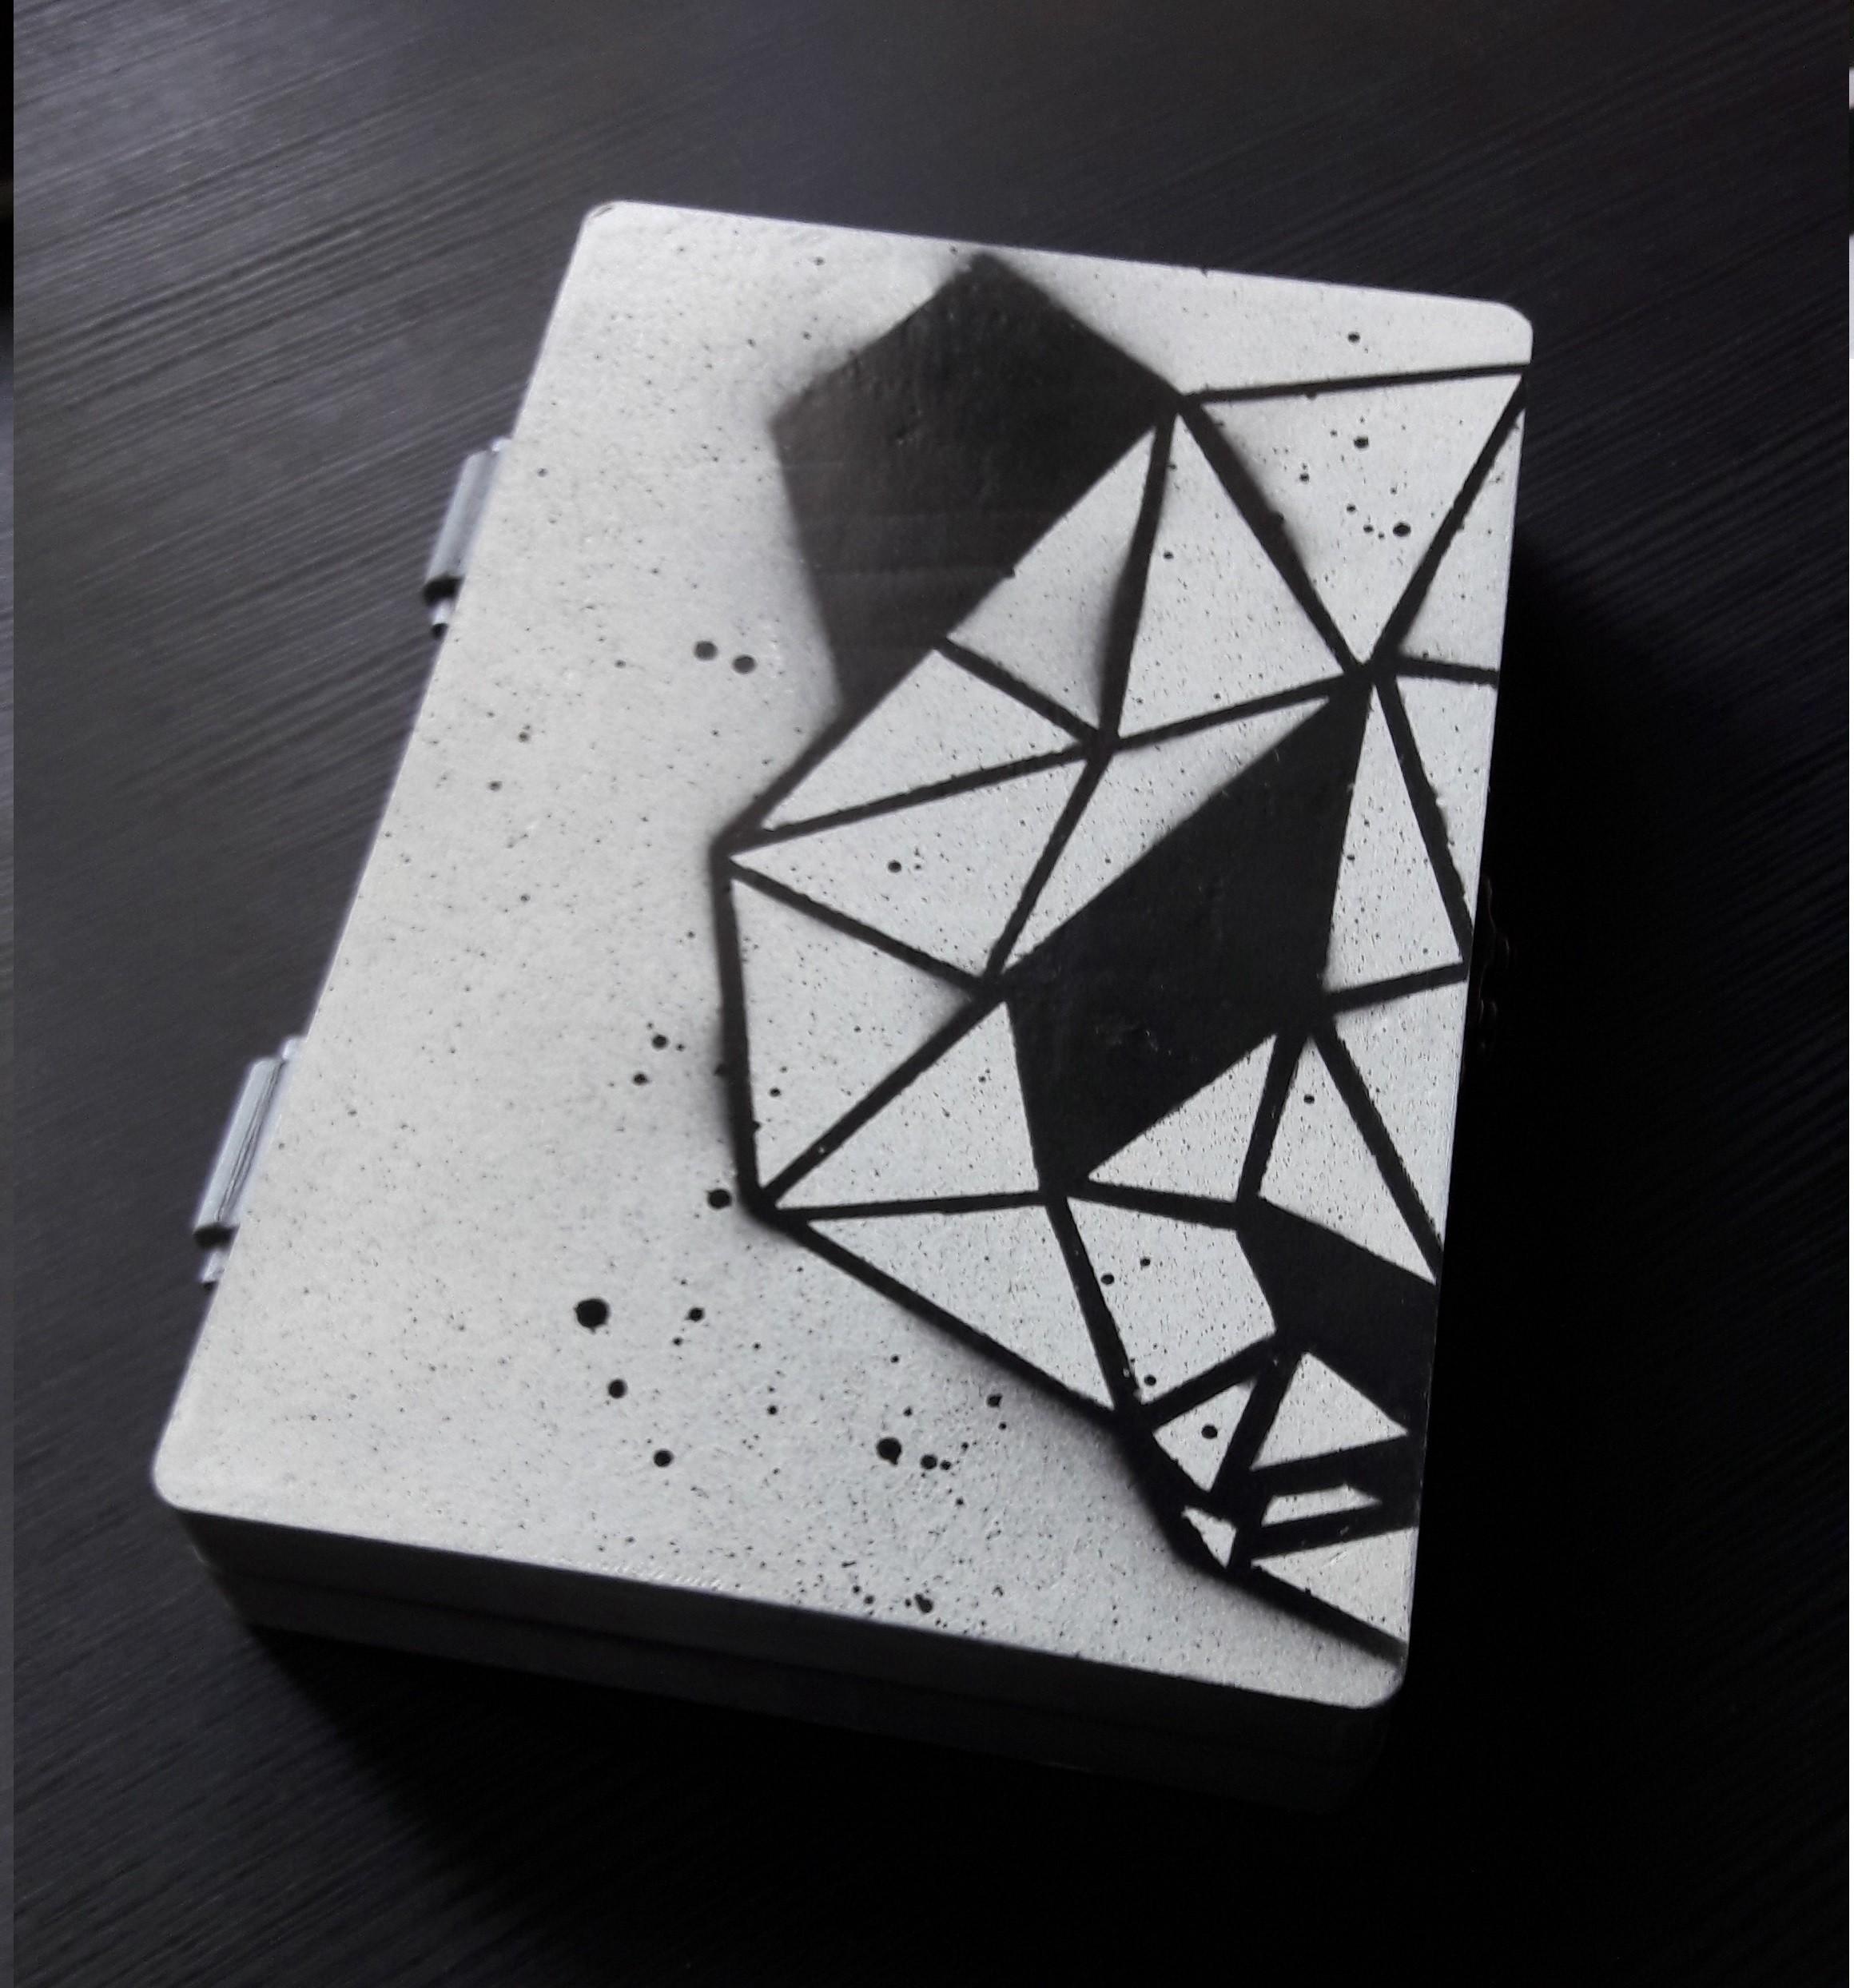 20170907_081635.jpg Download STL file Backgammon game • 3D print template, eliza_sparrow